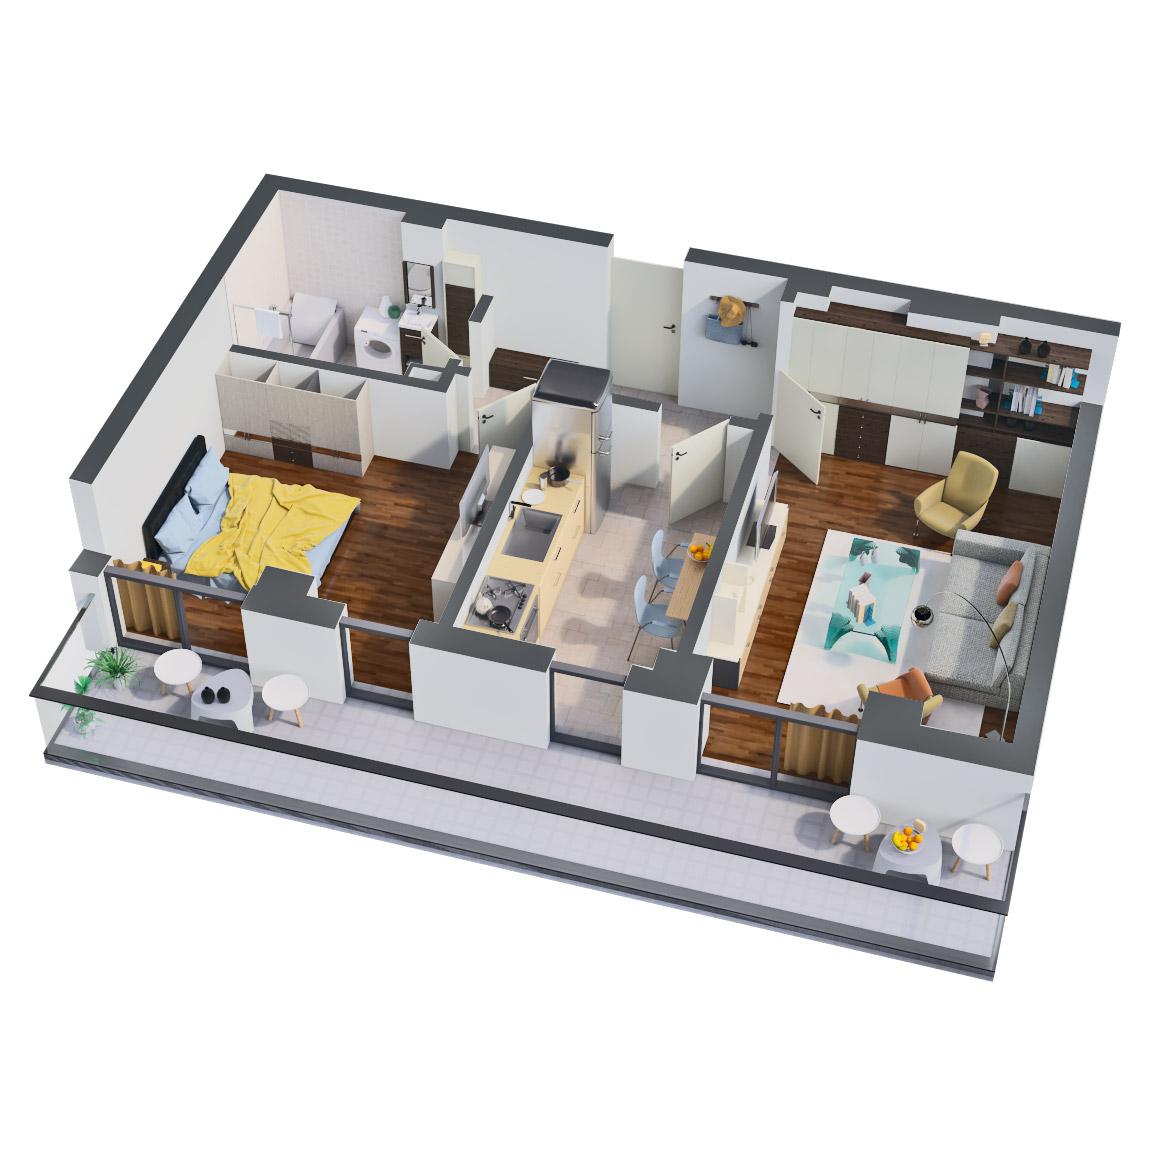 Apartament 2 camere de vanzare Bucuresti - Catedral Residence - Marriott, Piata Unirii, 13 Septembrie, Izvor - Tip 4 - T1 - B